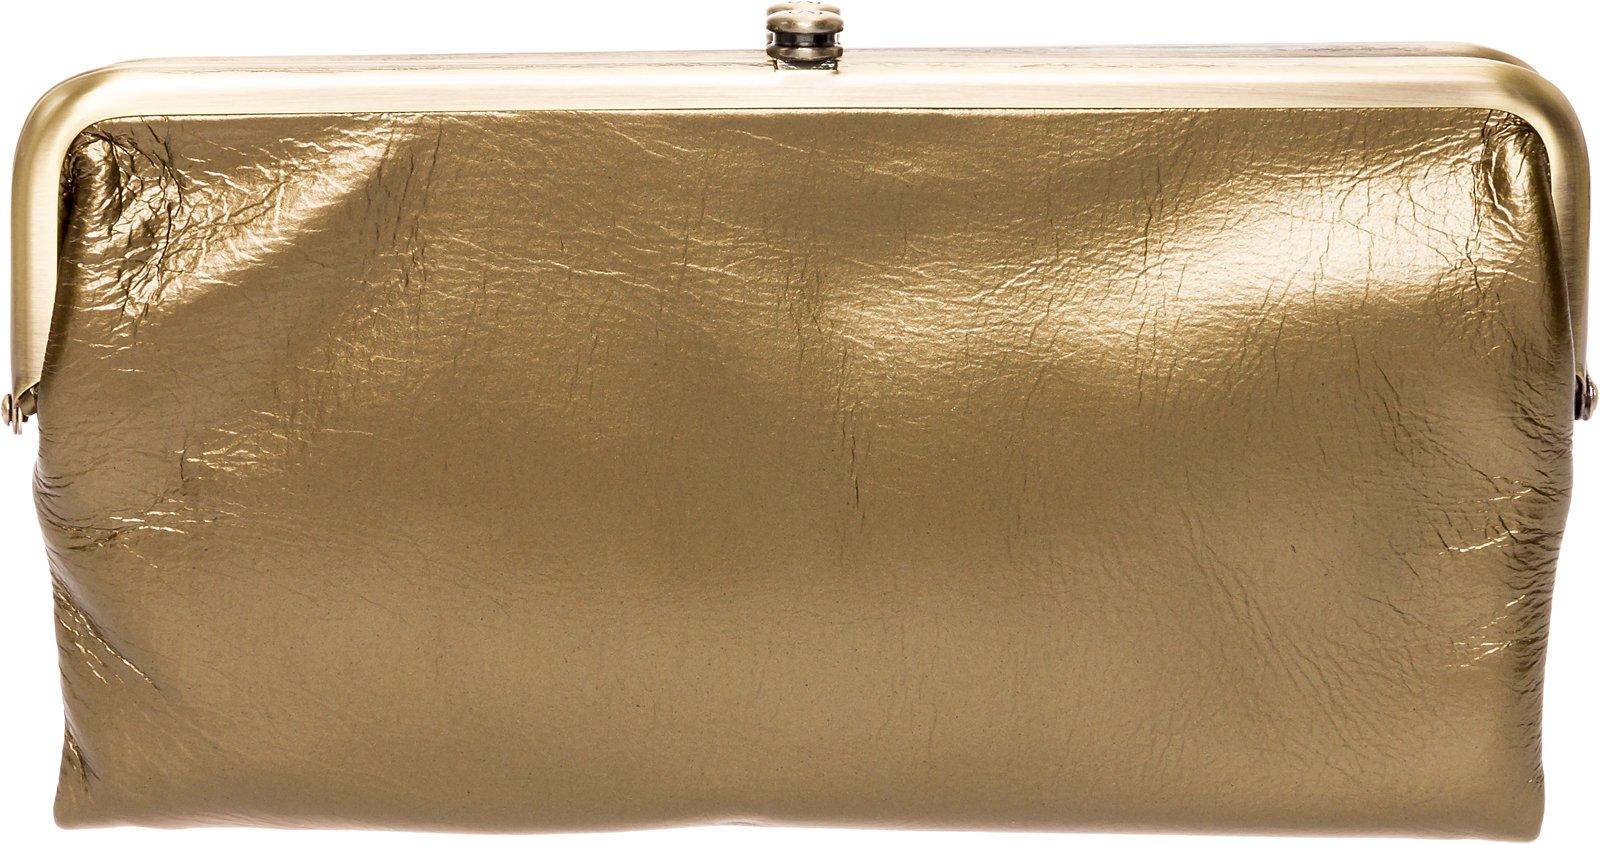 HOBO Womens Lauren Vintage Wallet Clutch Purse (Canteen) by HOBO